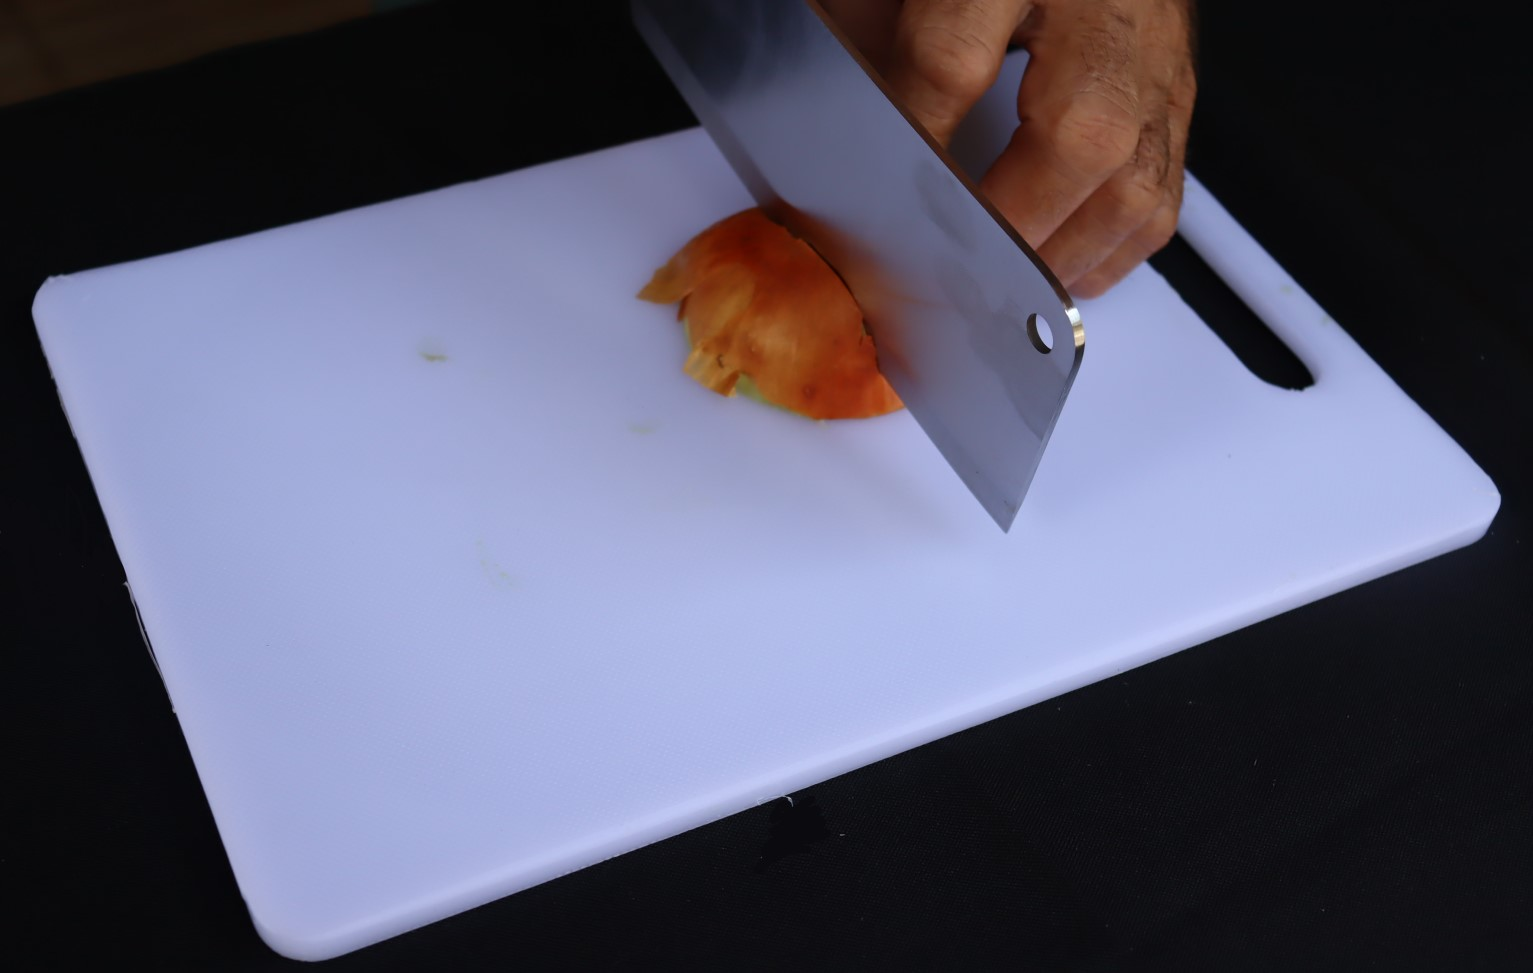 tabua de corte carne cozinha pvc branca higienica 20x30cm taboa de churrasco